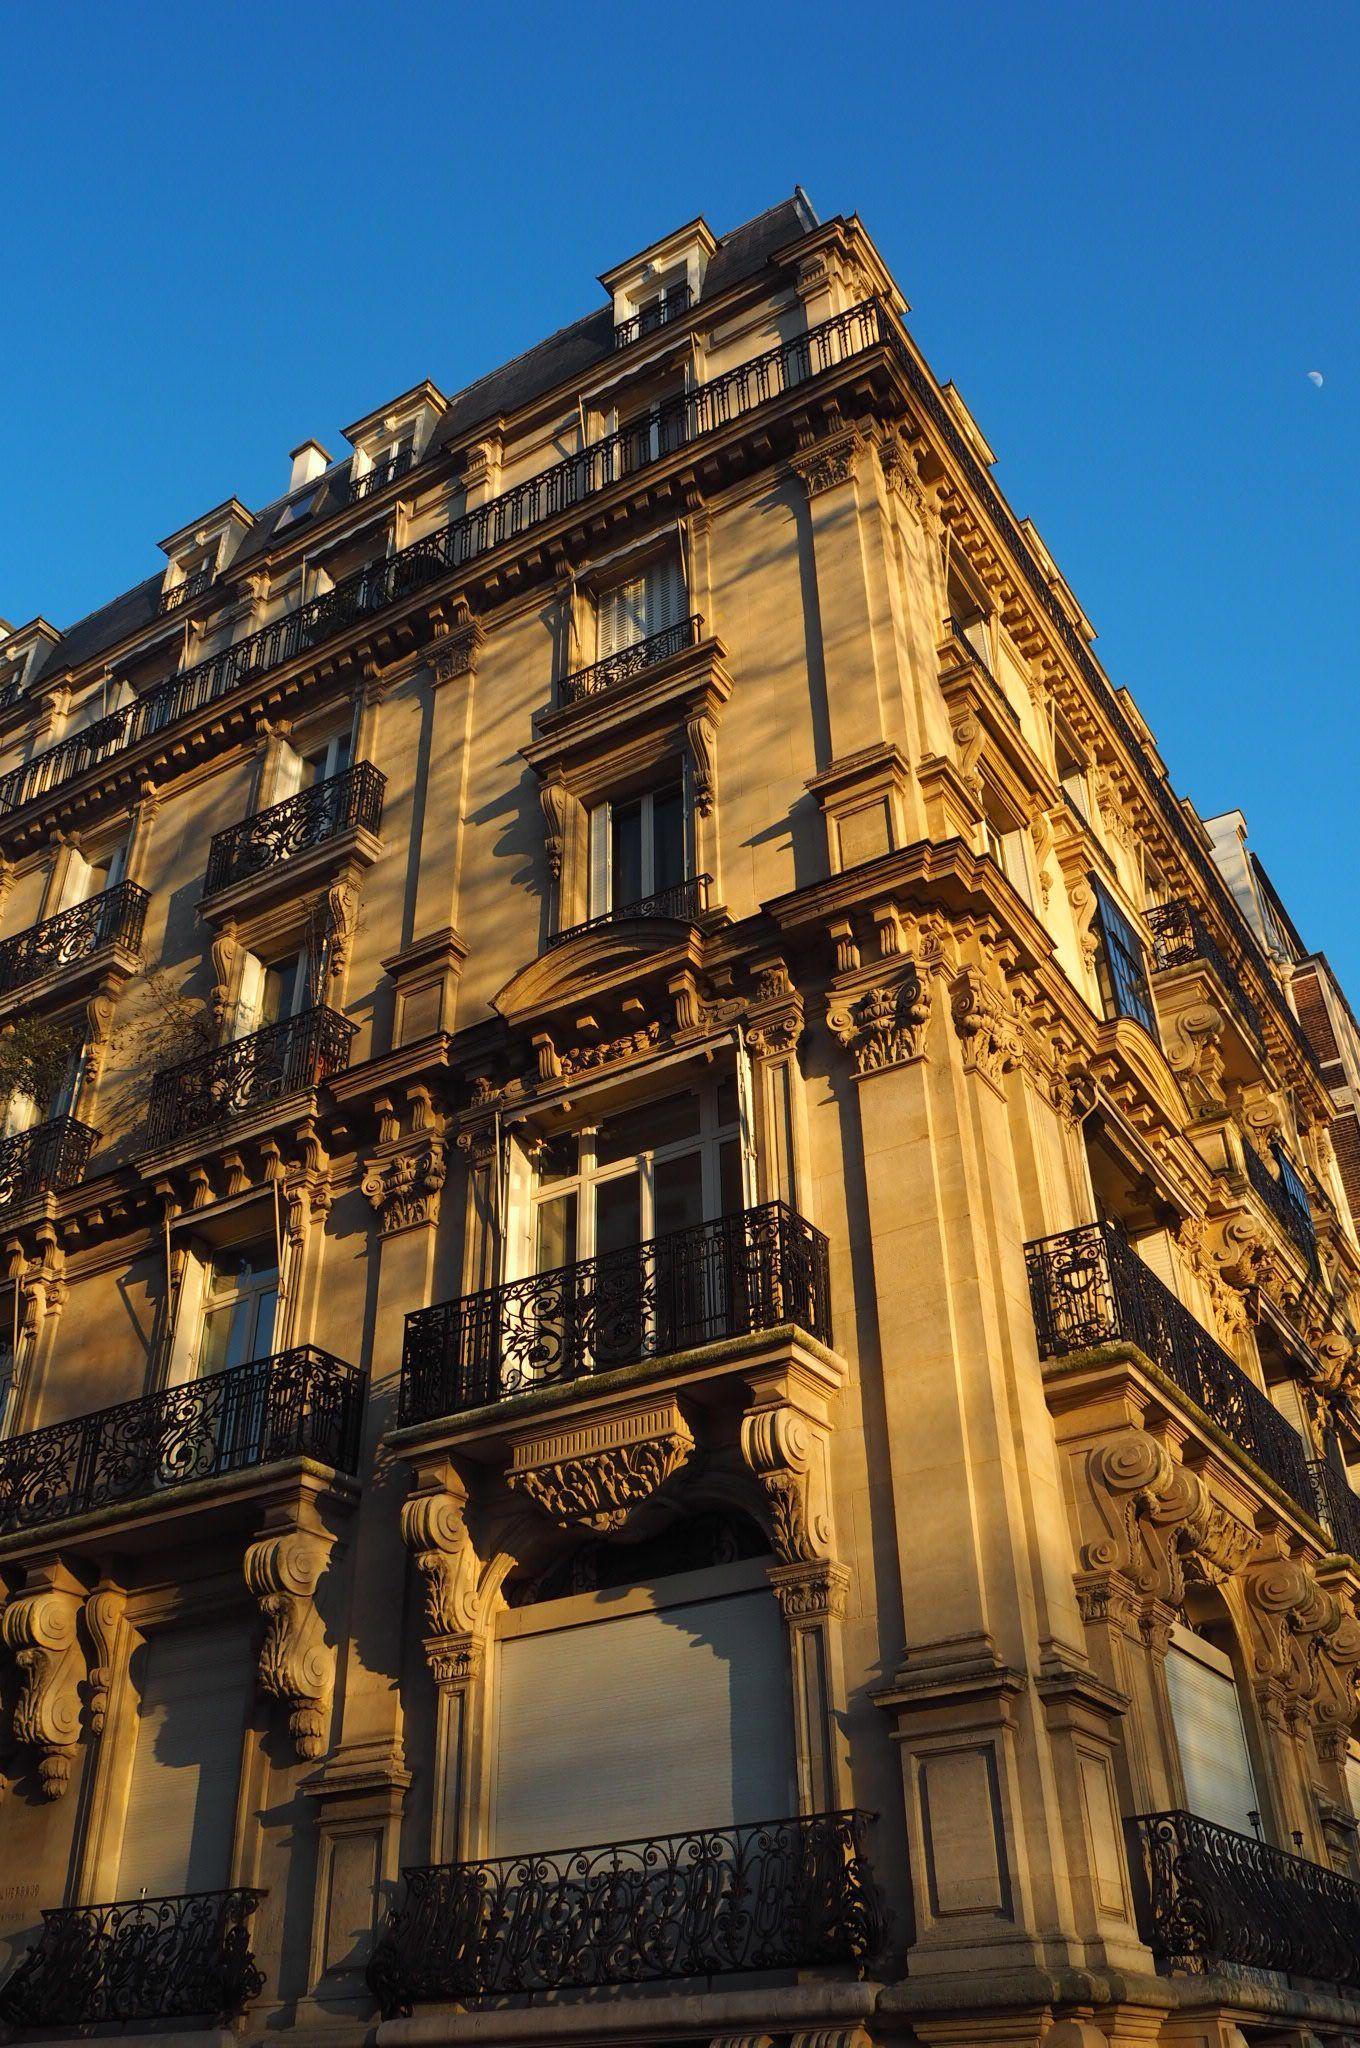 Architecture at Sunset in Paris